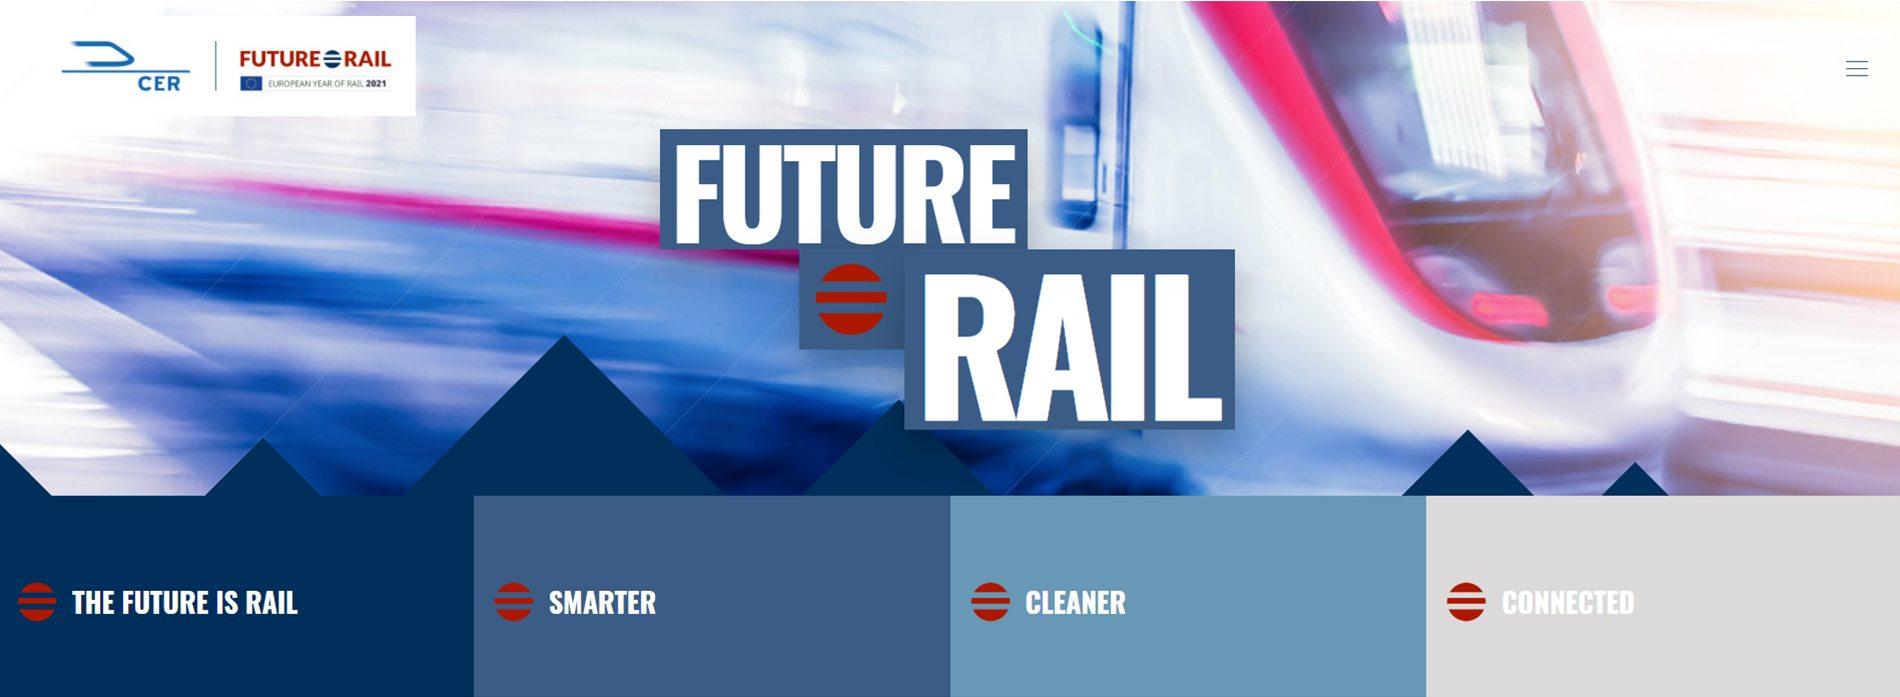 Future rail